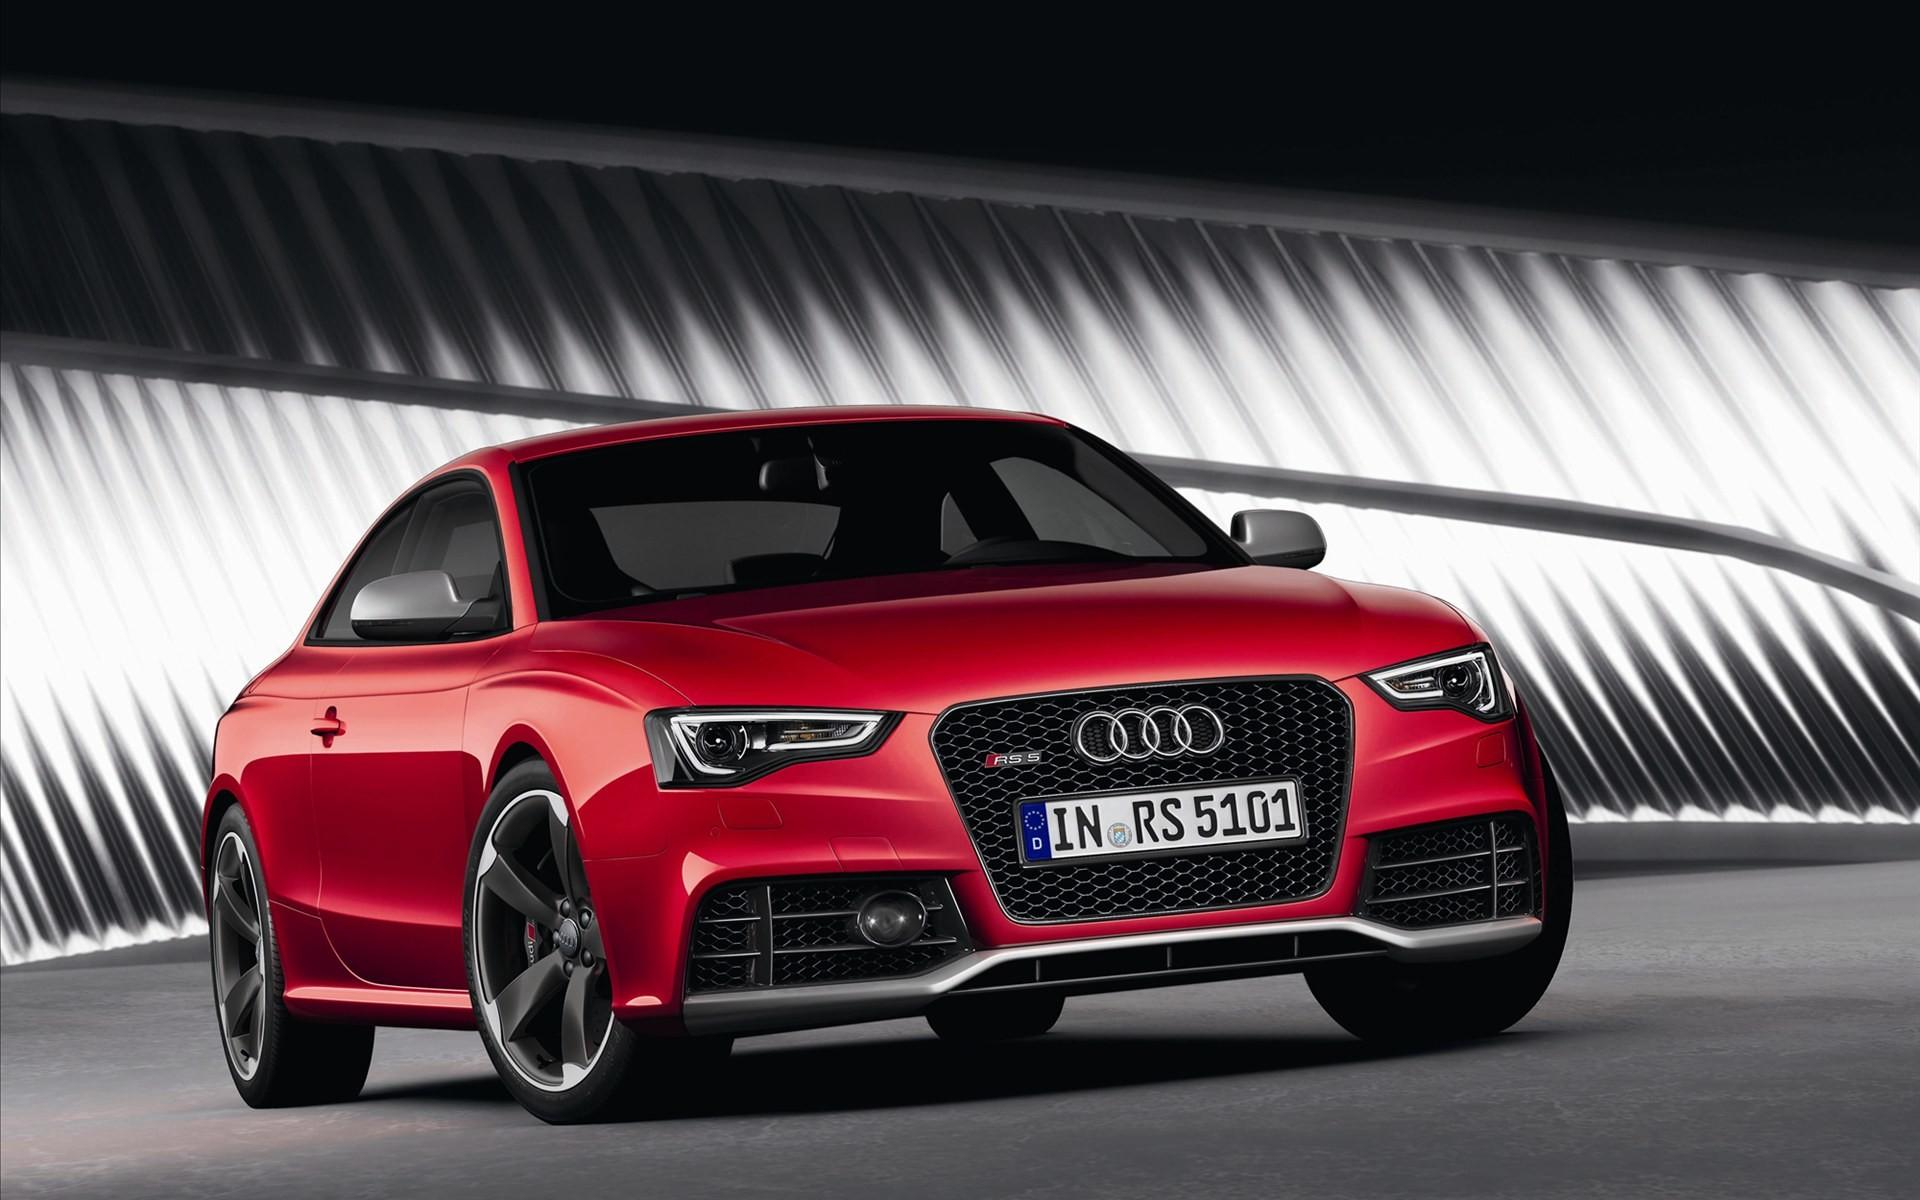 Audi RS5 Wallpaper (77+ images)